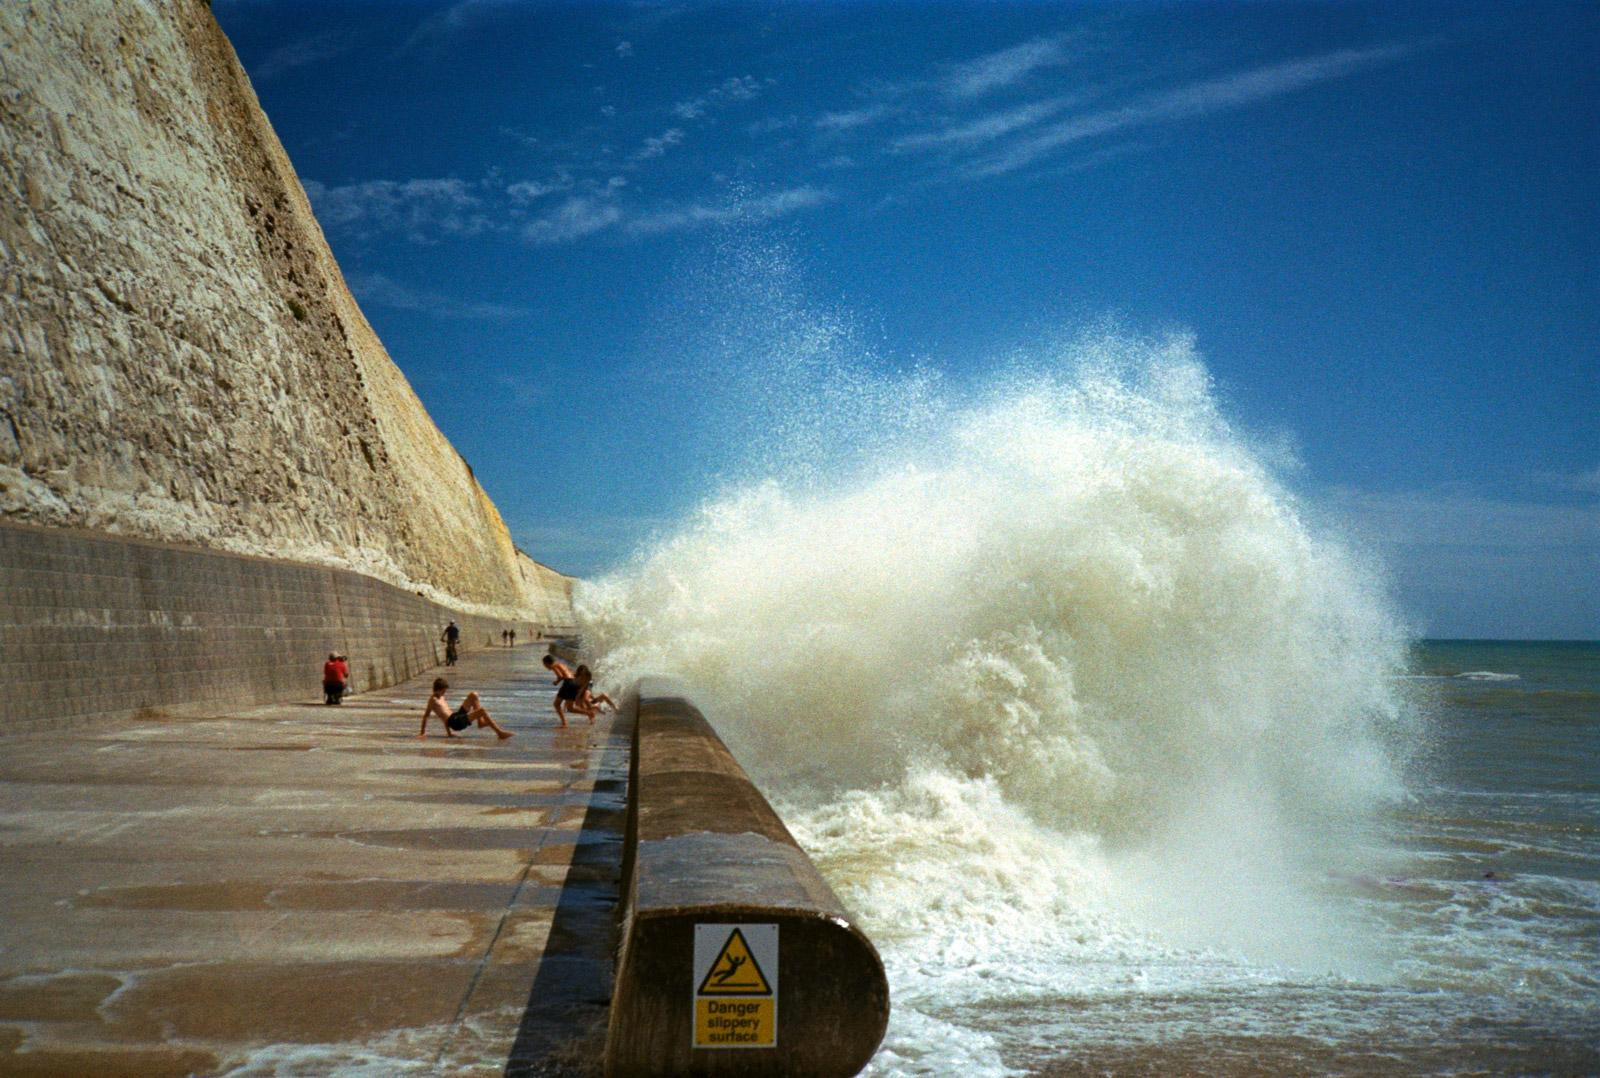 Kids Catching Waves, Coastal Seas, Taken while swimming in the sea, Photography On Kodak Film By Ioannis Koussertari